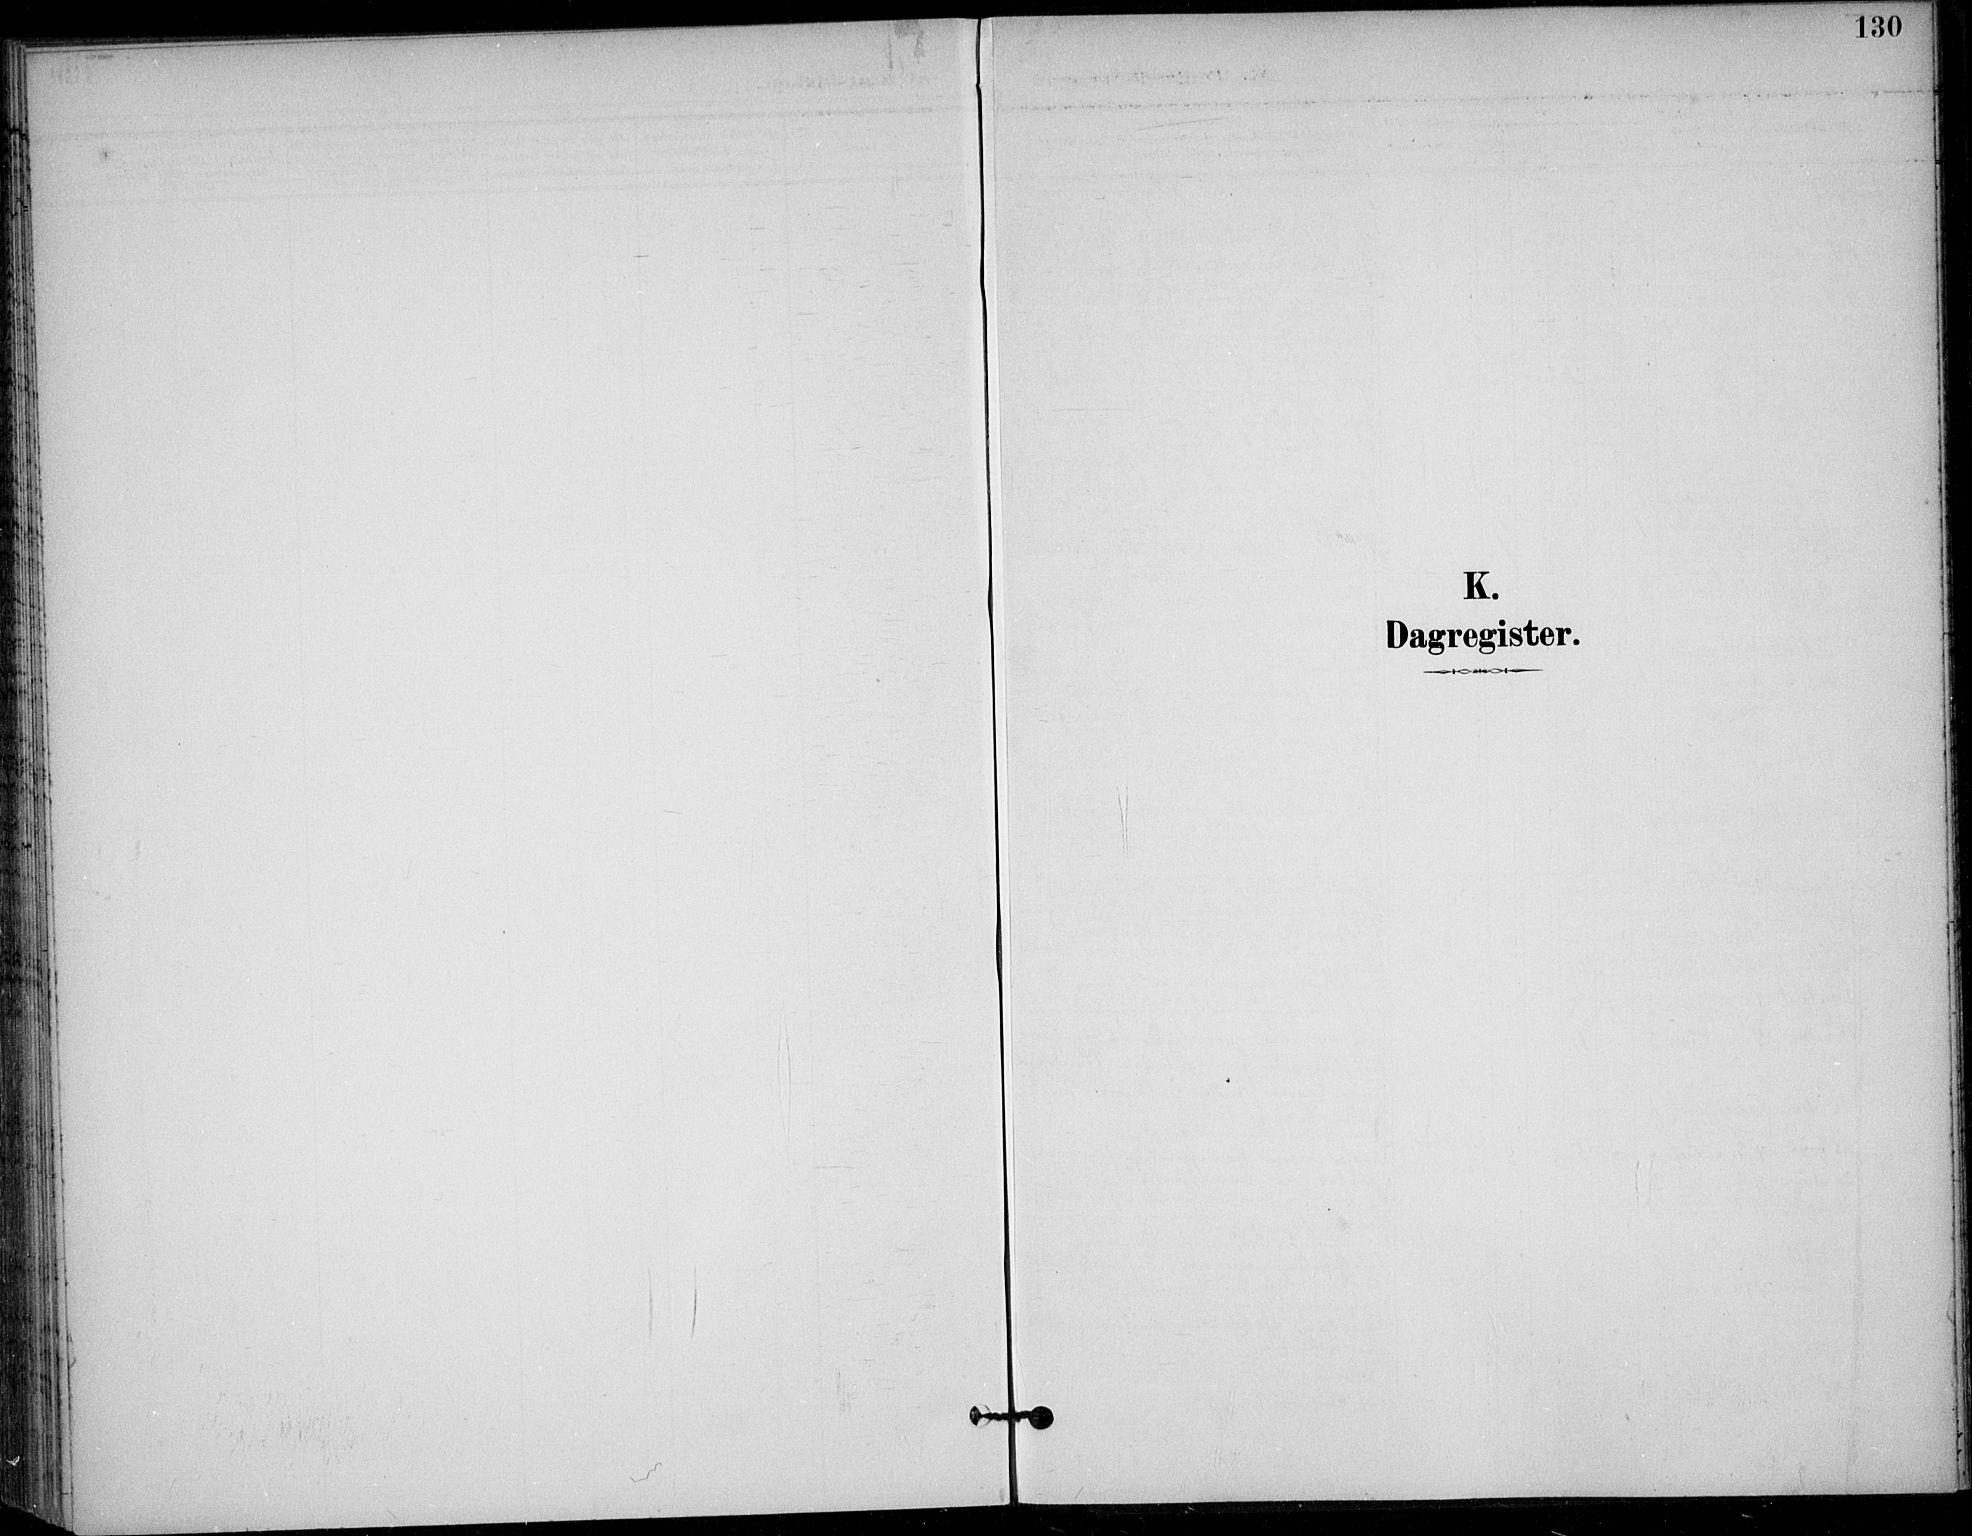 SAKO, Solum kirkebøker, F/Fc/L0002: Ministerialbok nr. III 2, 1892-1906, s. 130